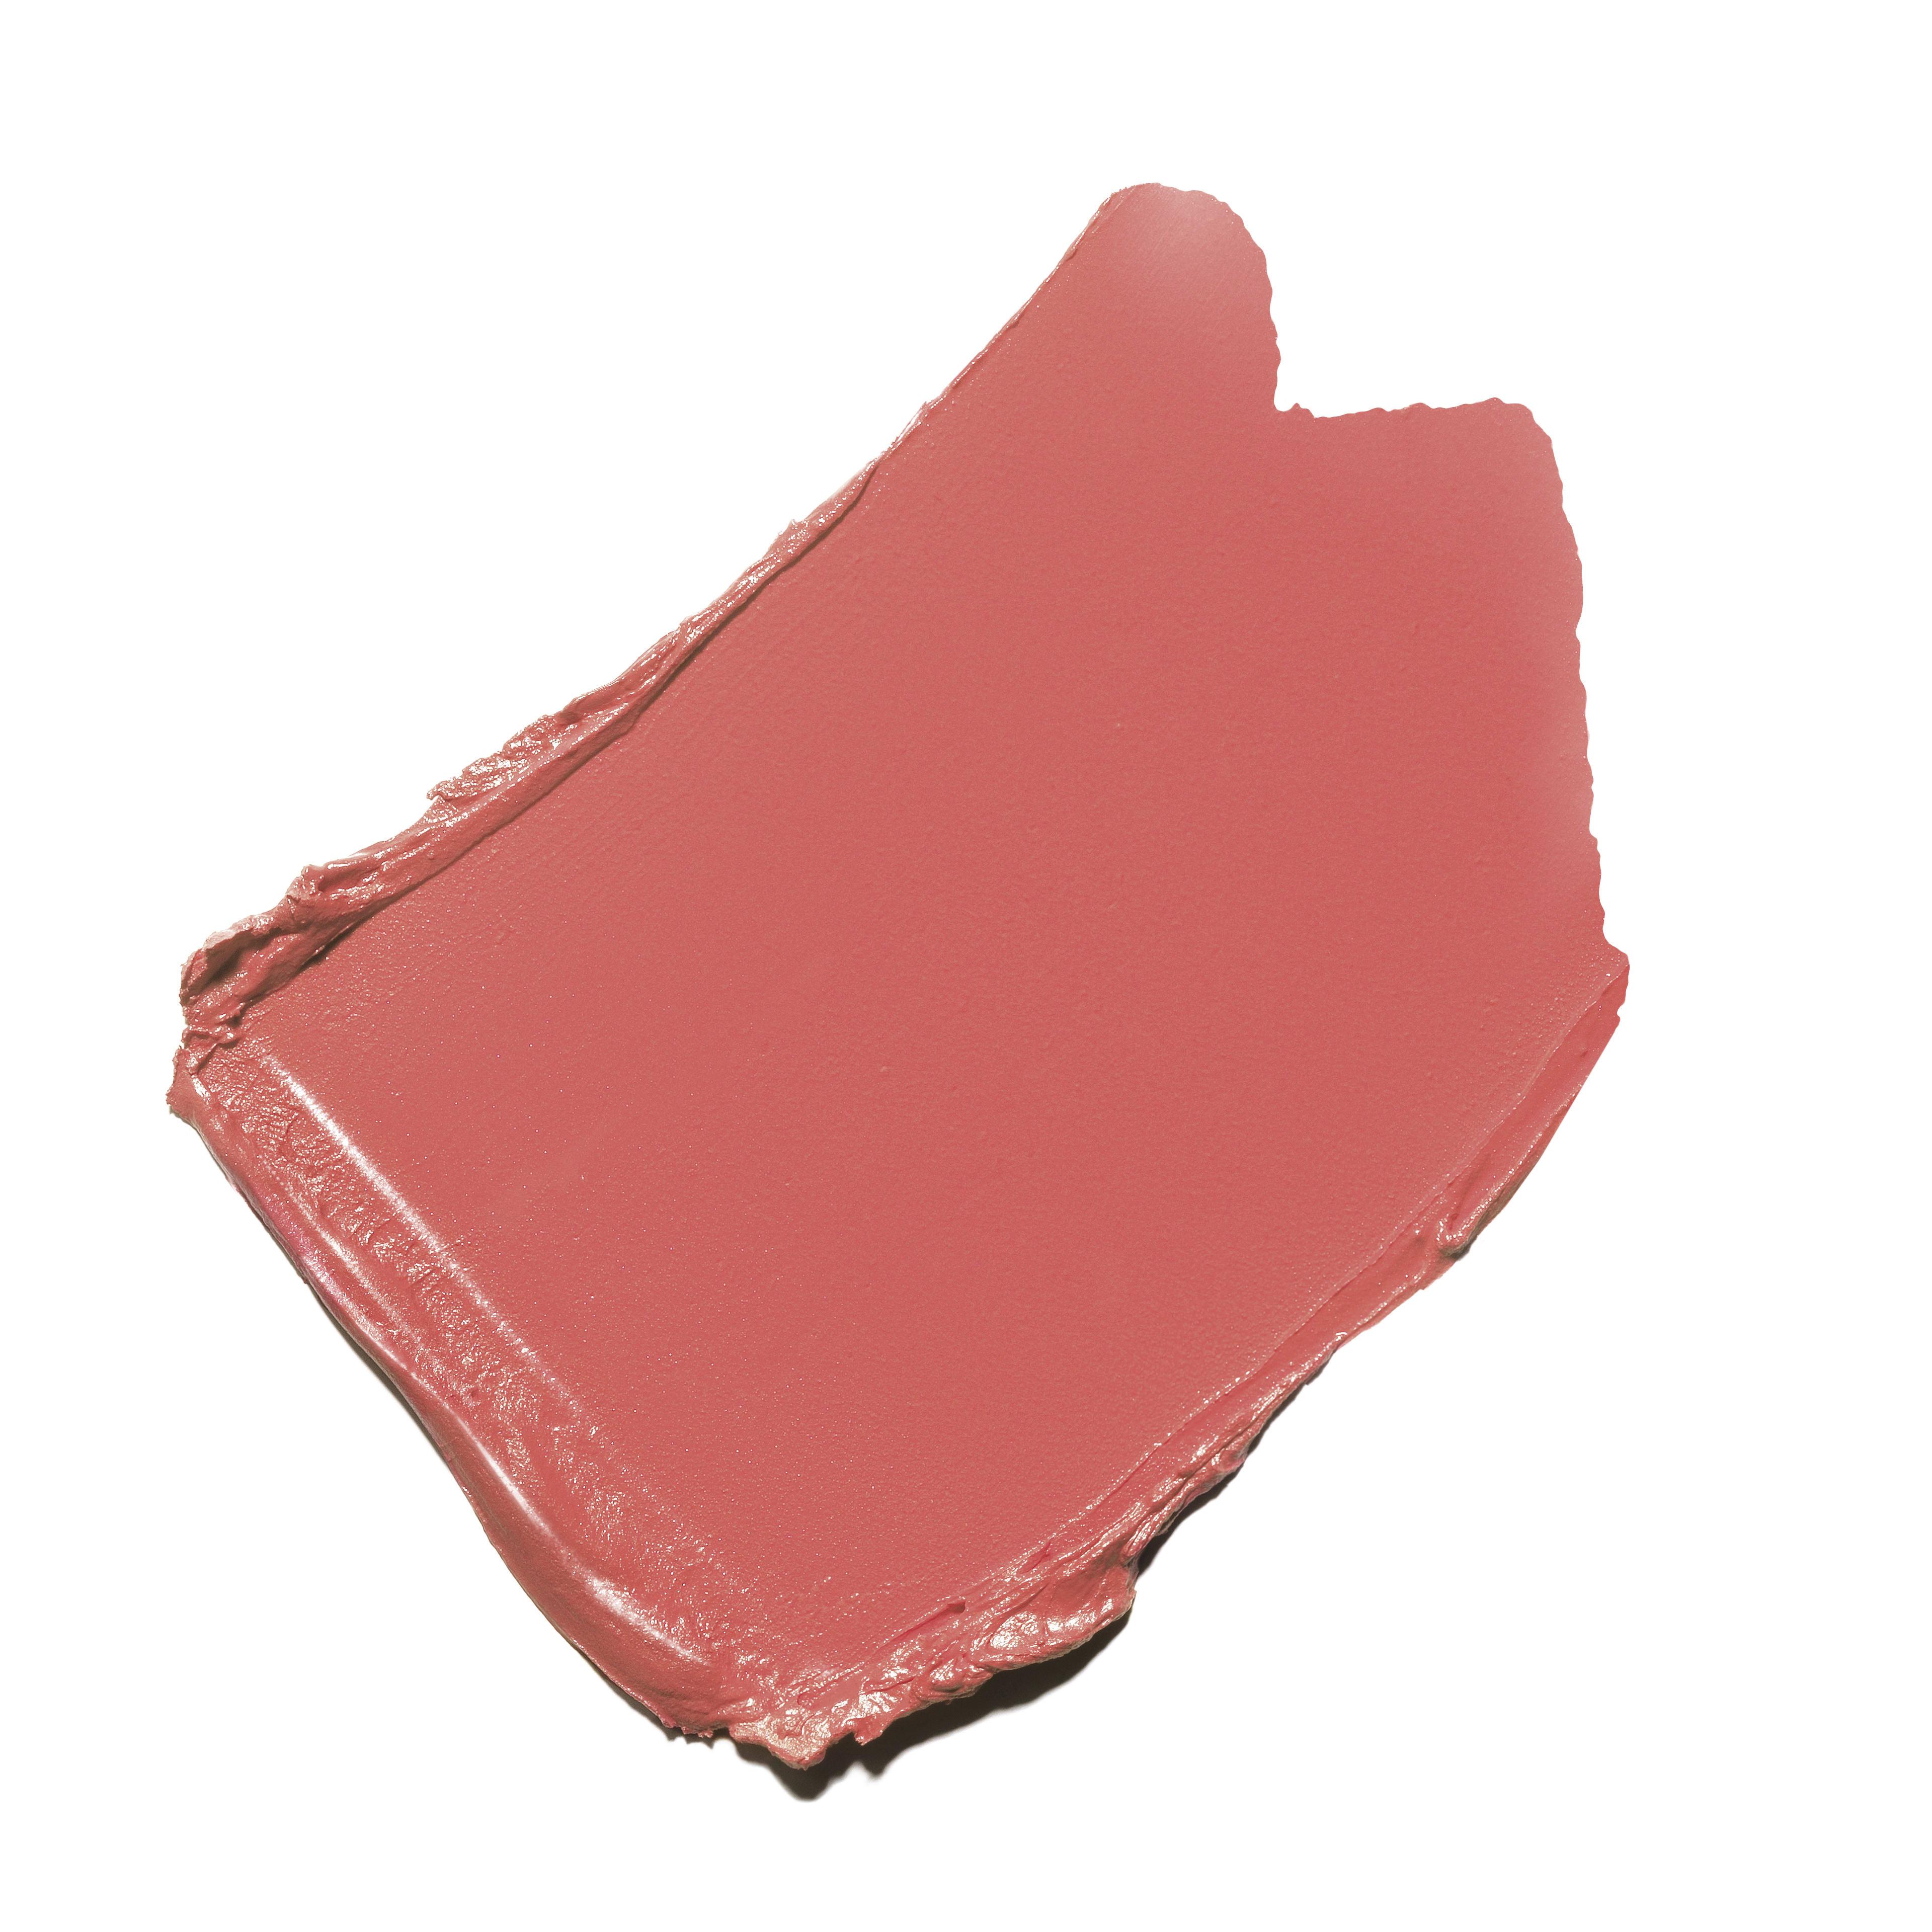 ROUGE ALLURE - ลิปสติก ROUGE ALLURE - makeup - 3.5g - มุมมองพื้นผิวธรรมดา